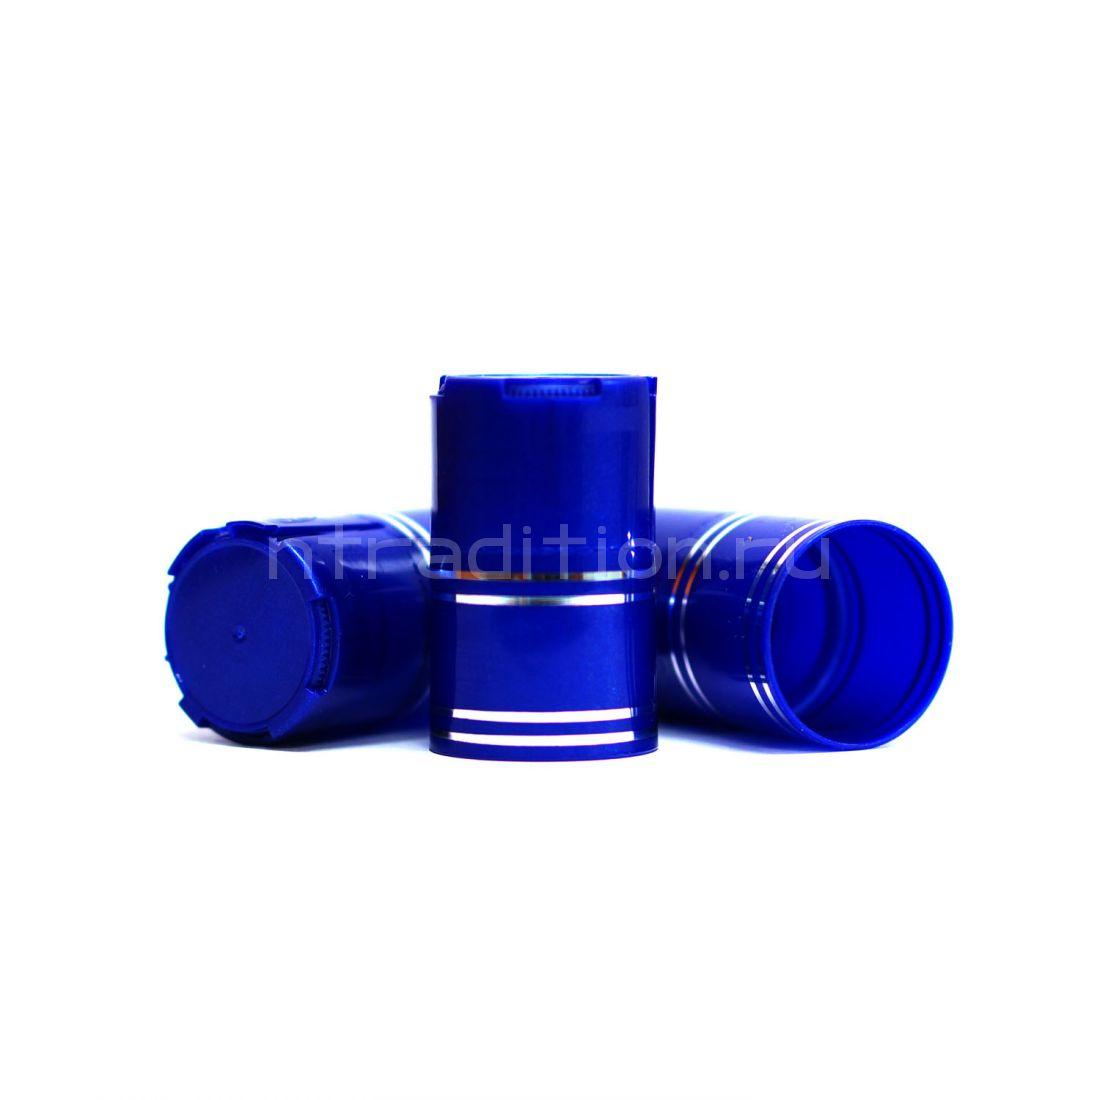 Пластиковый колпачок на бутылку винт 28*18 мм, 10 шт (синий)